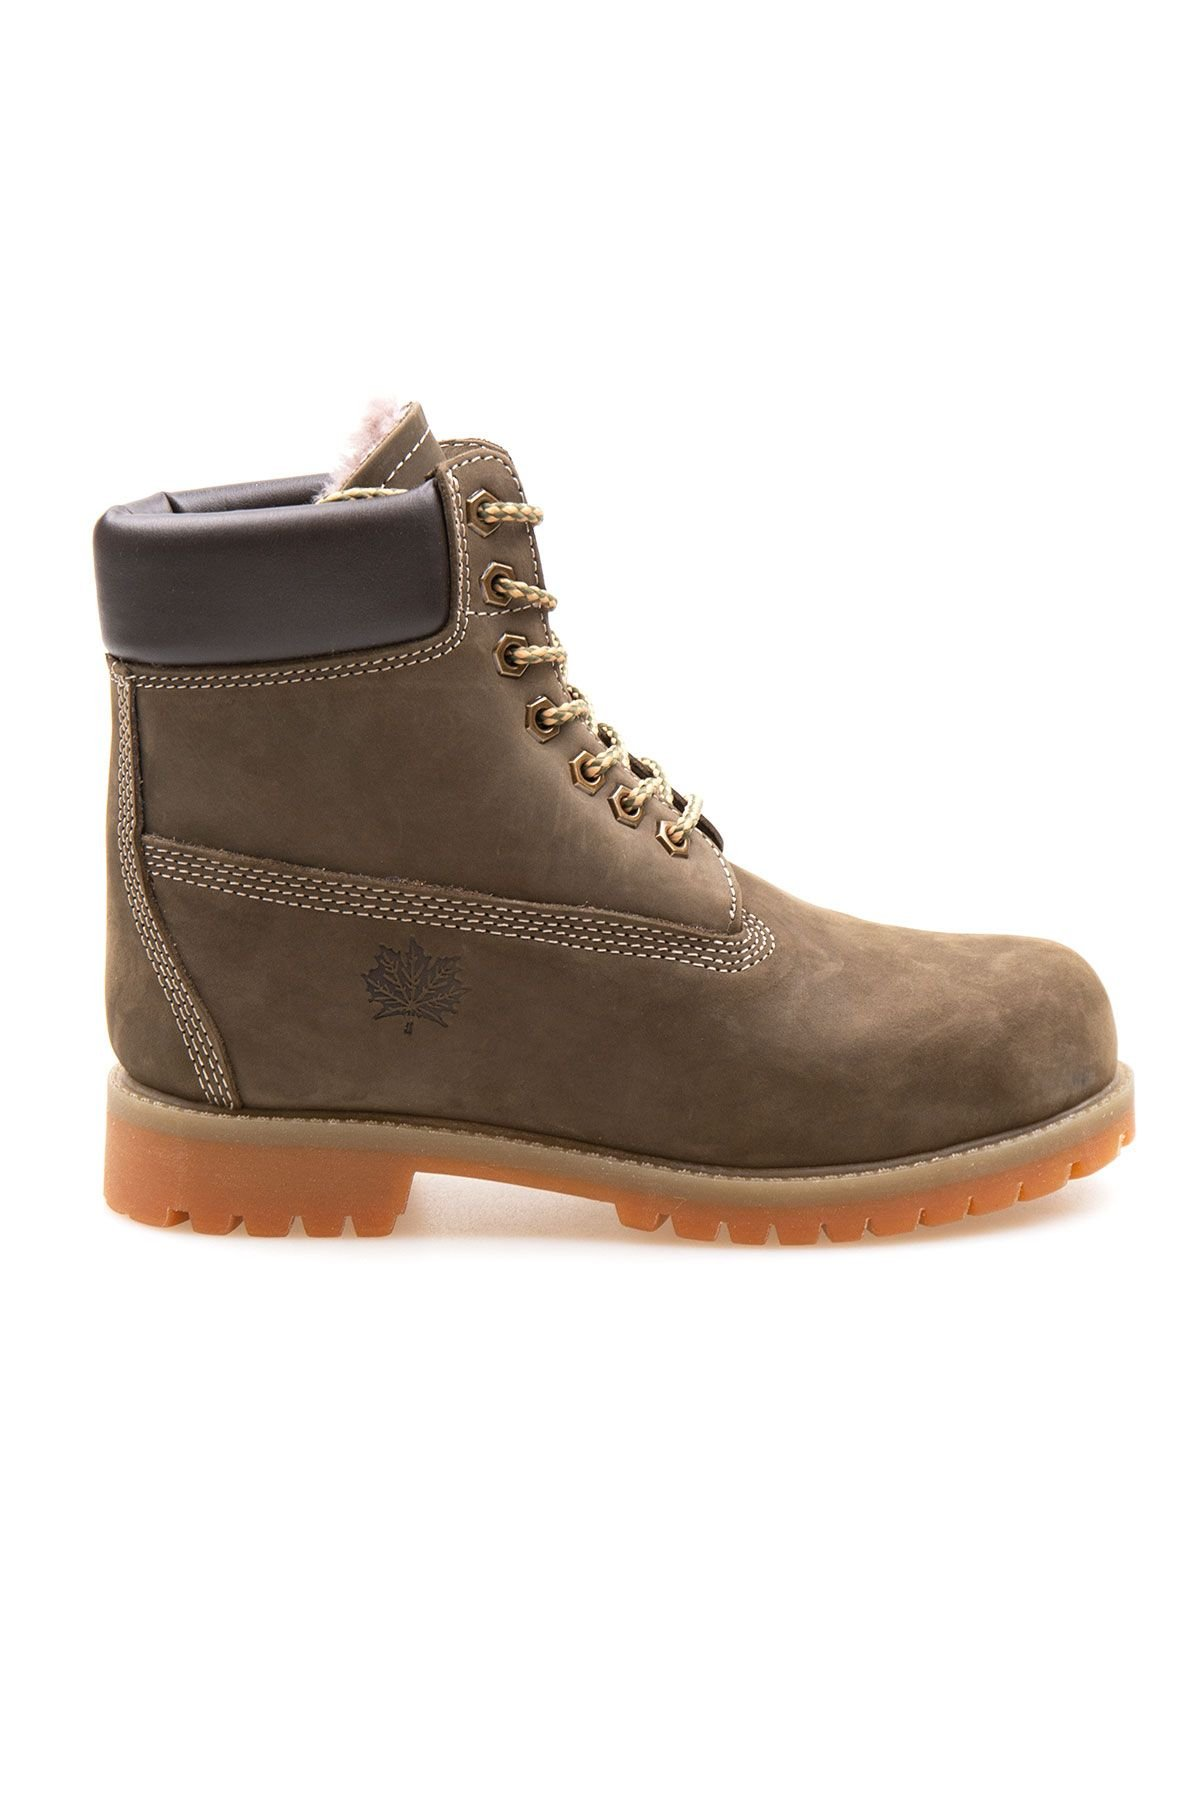 Pegia Genuine Nubuck Women's Boots 500800 Khaki